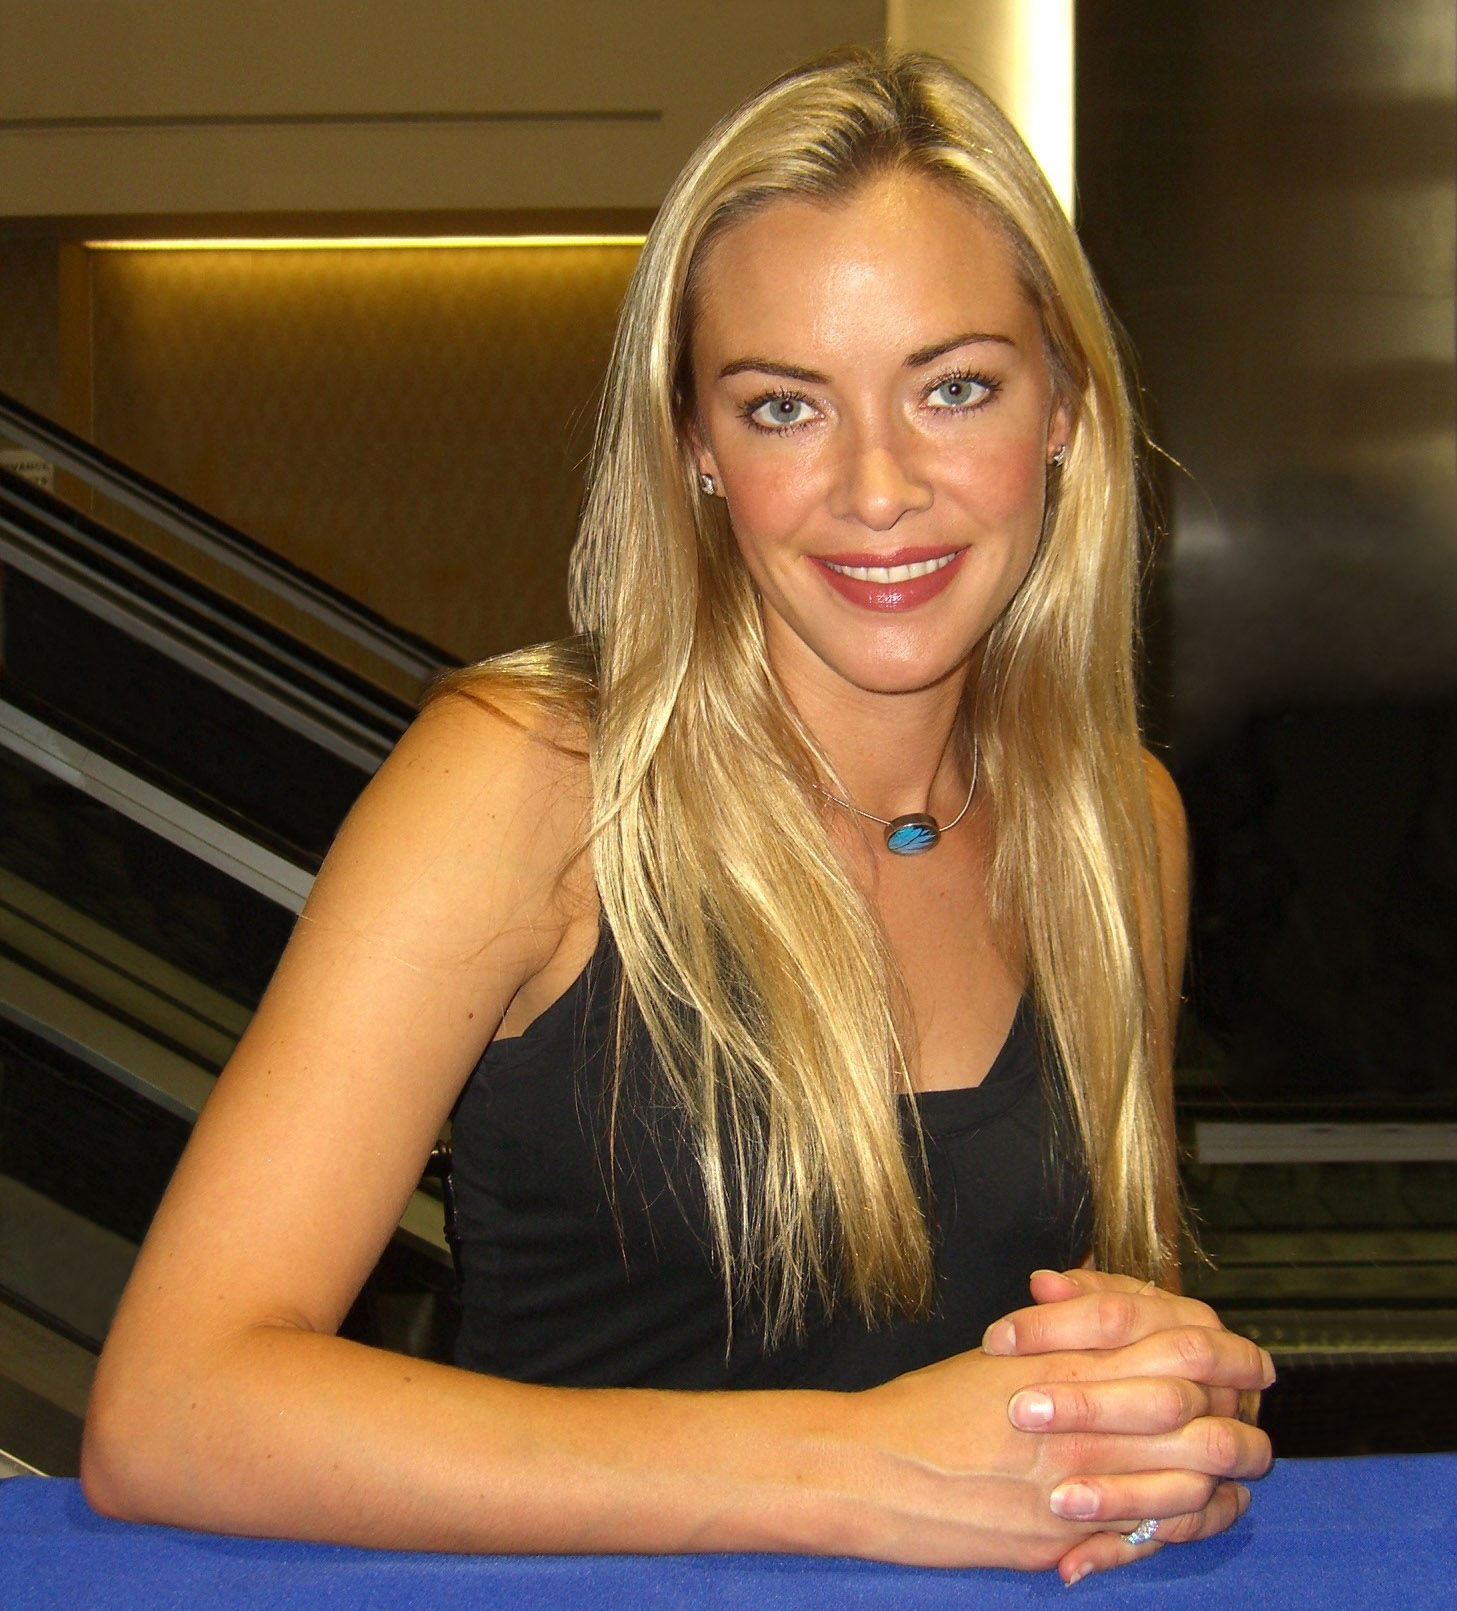 Photo of Kristanna Loken: American actress